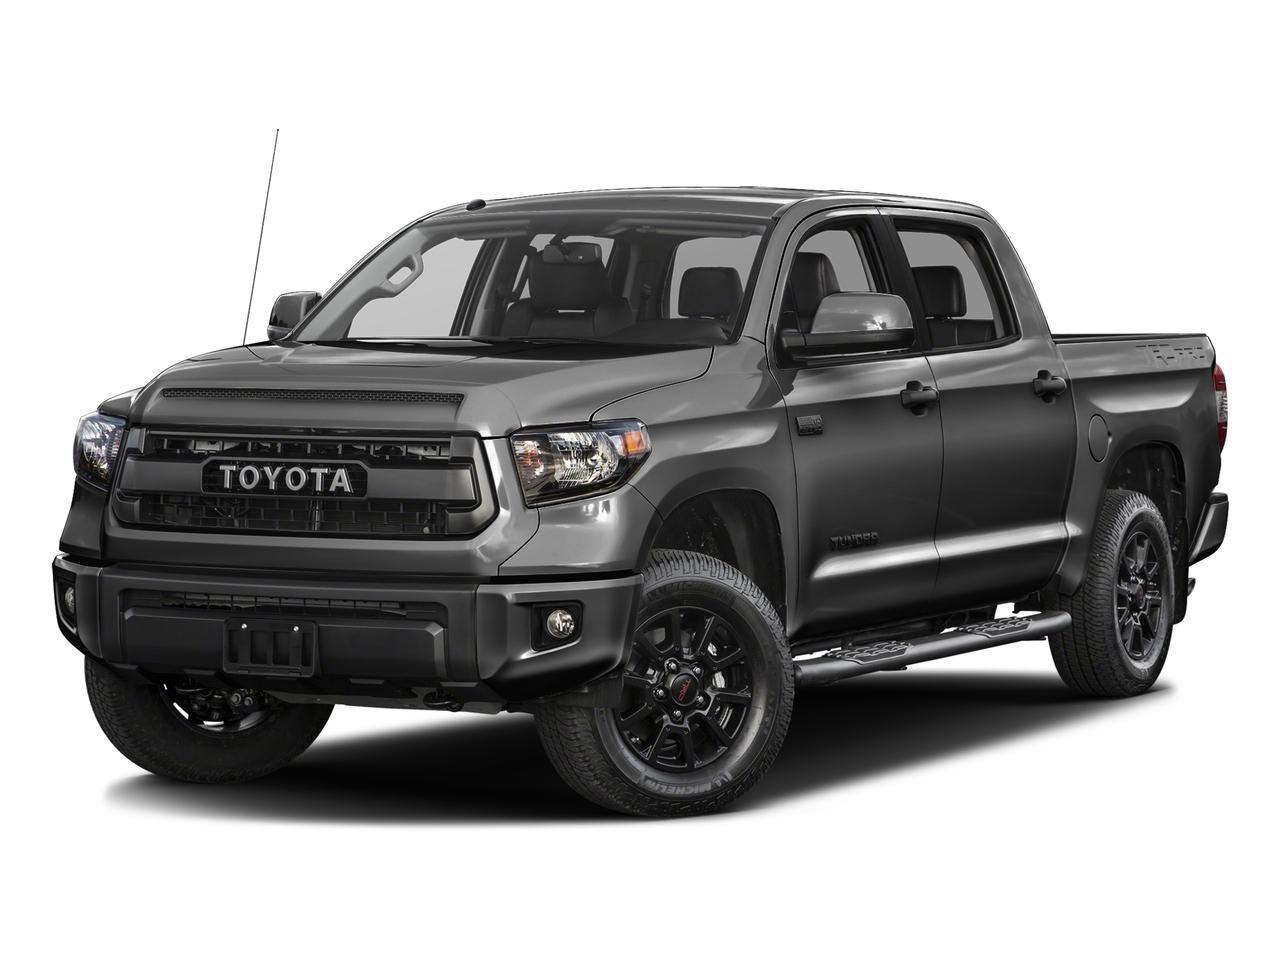 2016 Toyota Tundra 4WD Truck Vehicle Photo in Corpus Christi, TX 78411